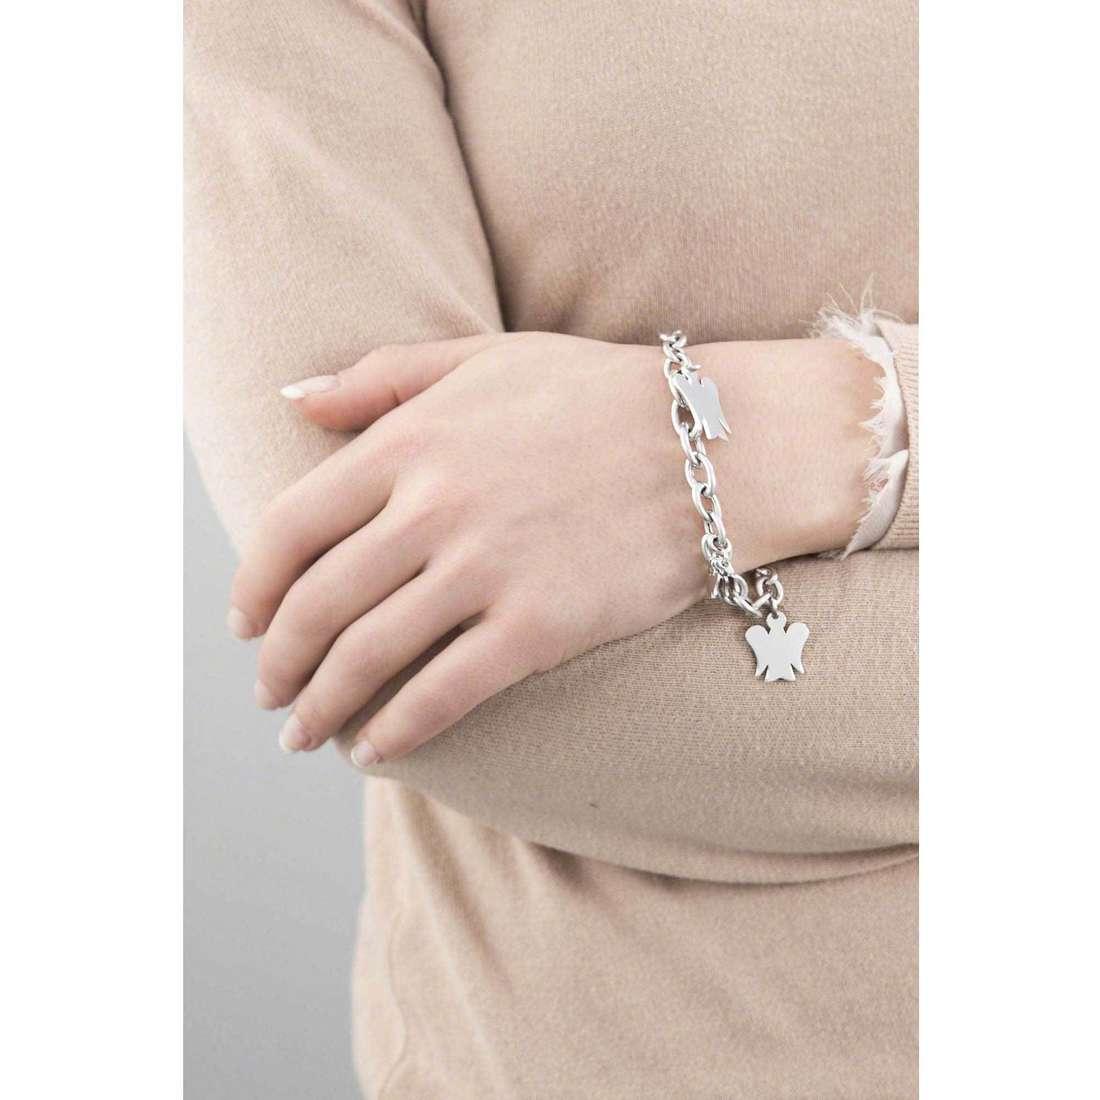 Giannotti bracciali Chiama Angeli donna GIA123 indosso